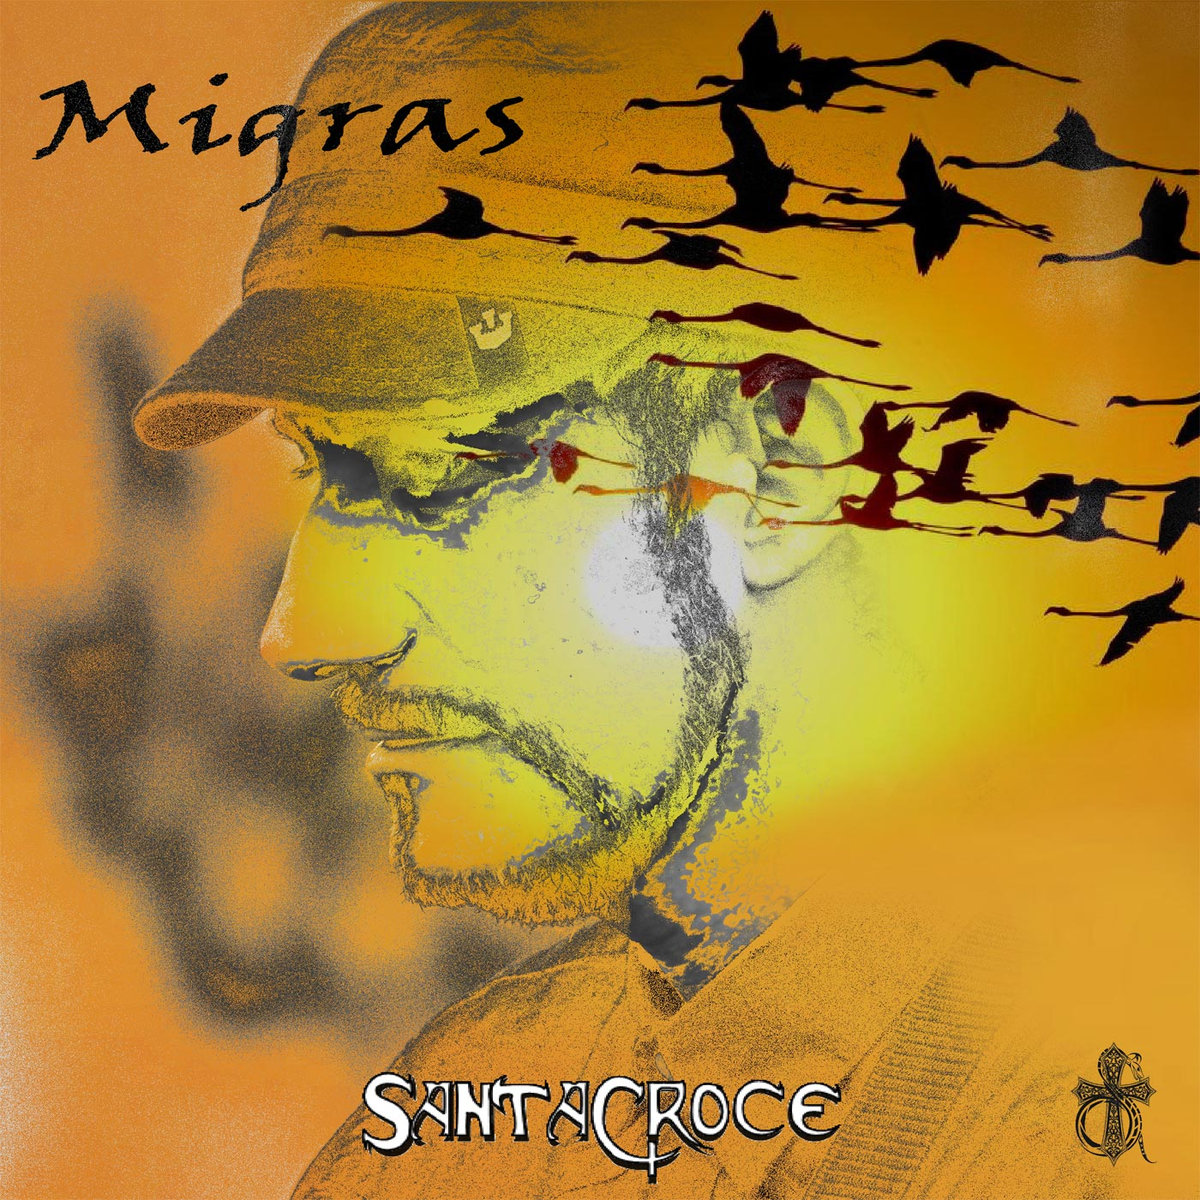 Santacroce - Migras 2 Iyezine.com